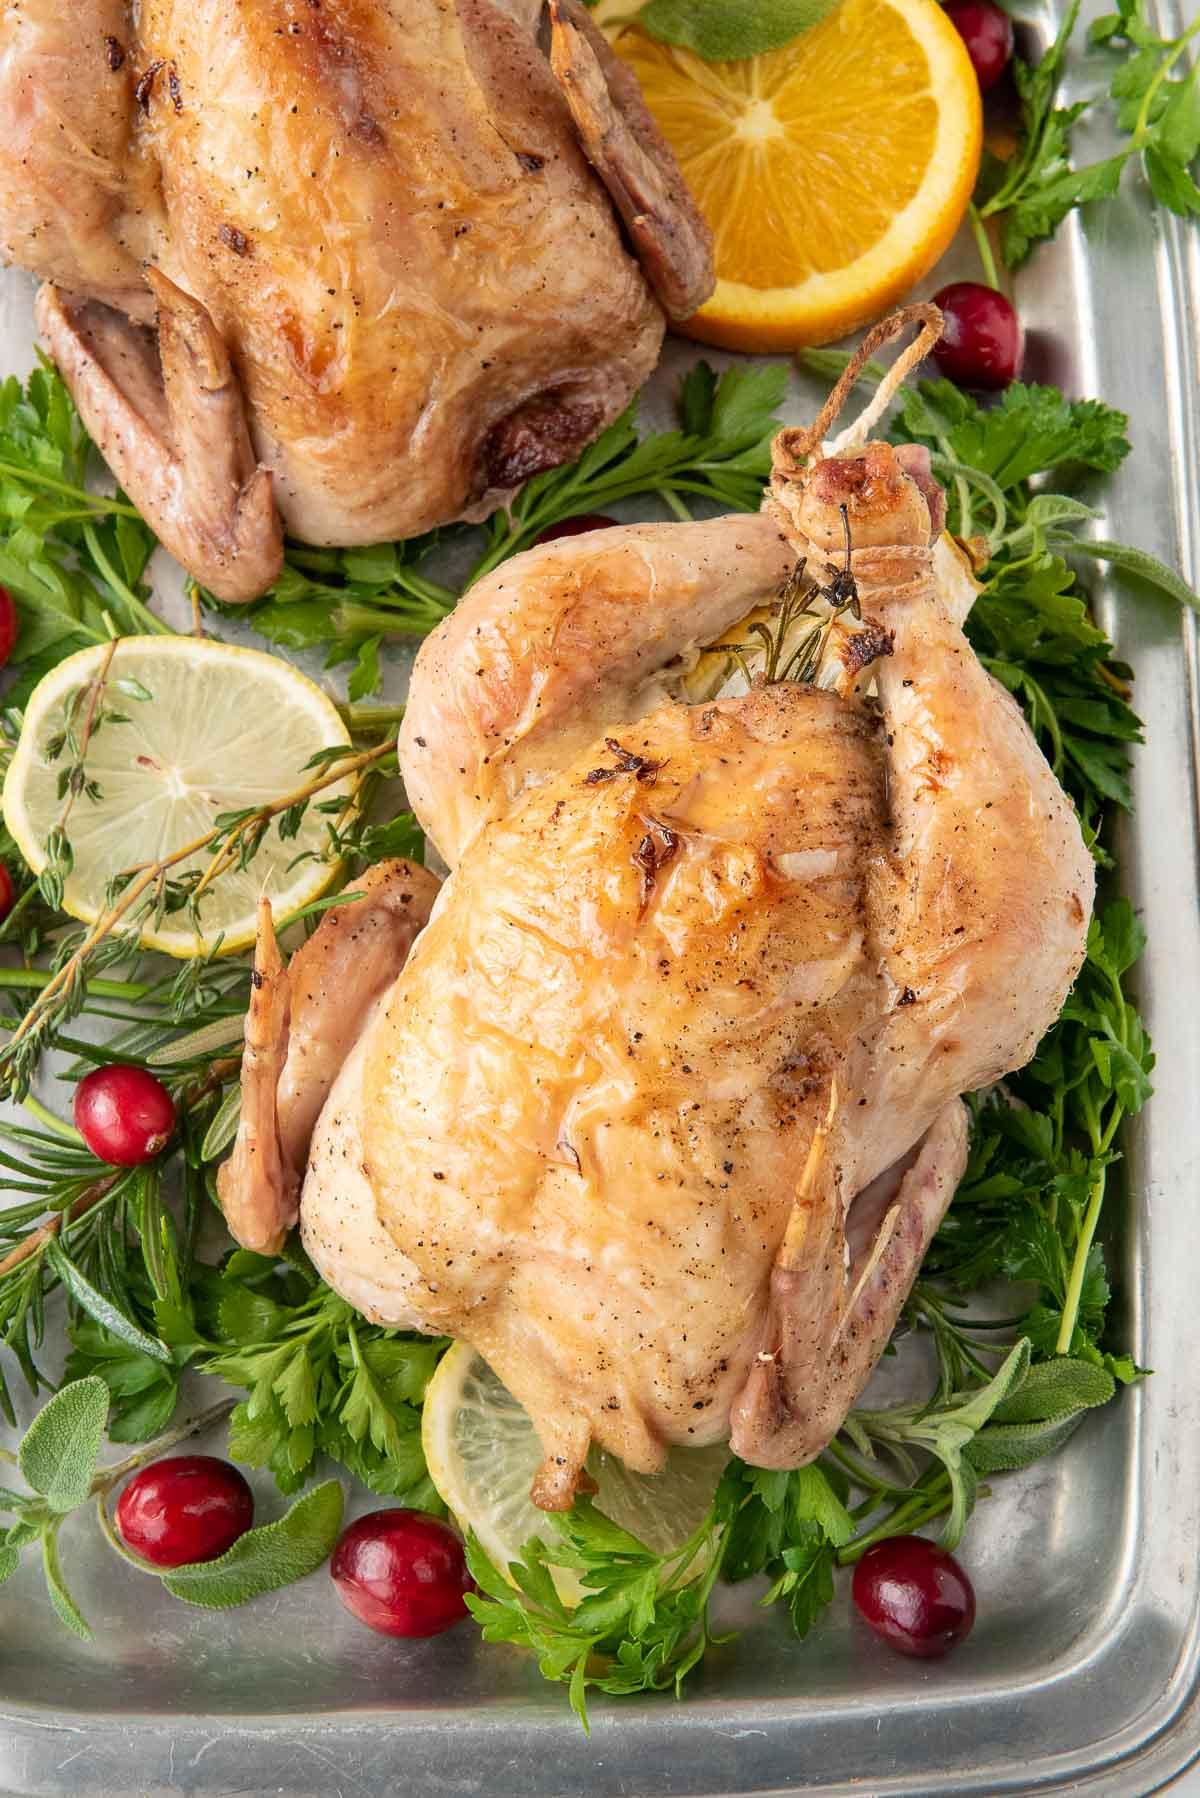 cornish hen baked on greens